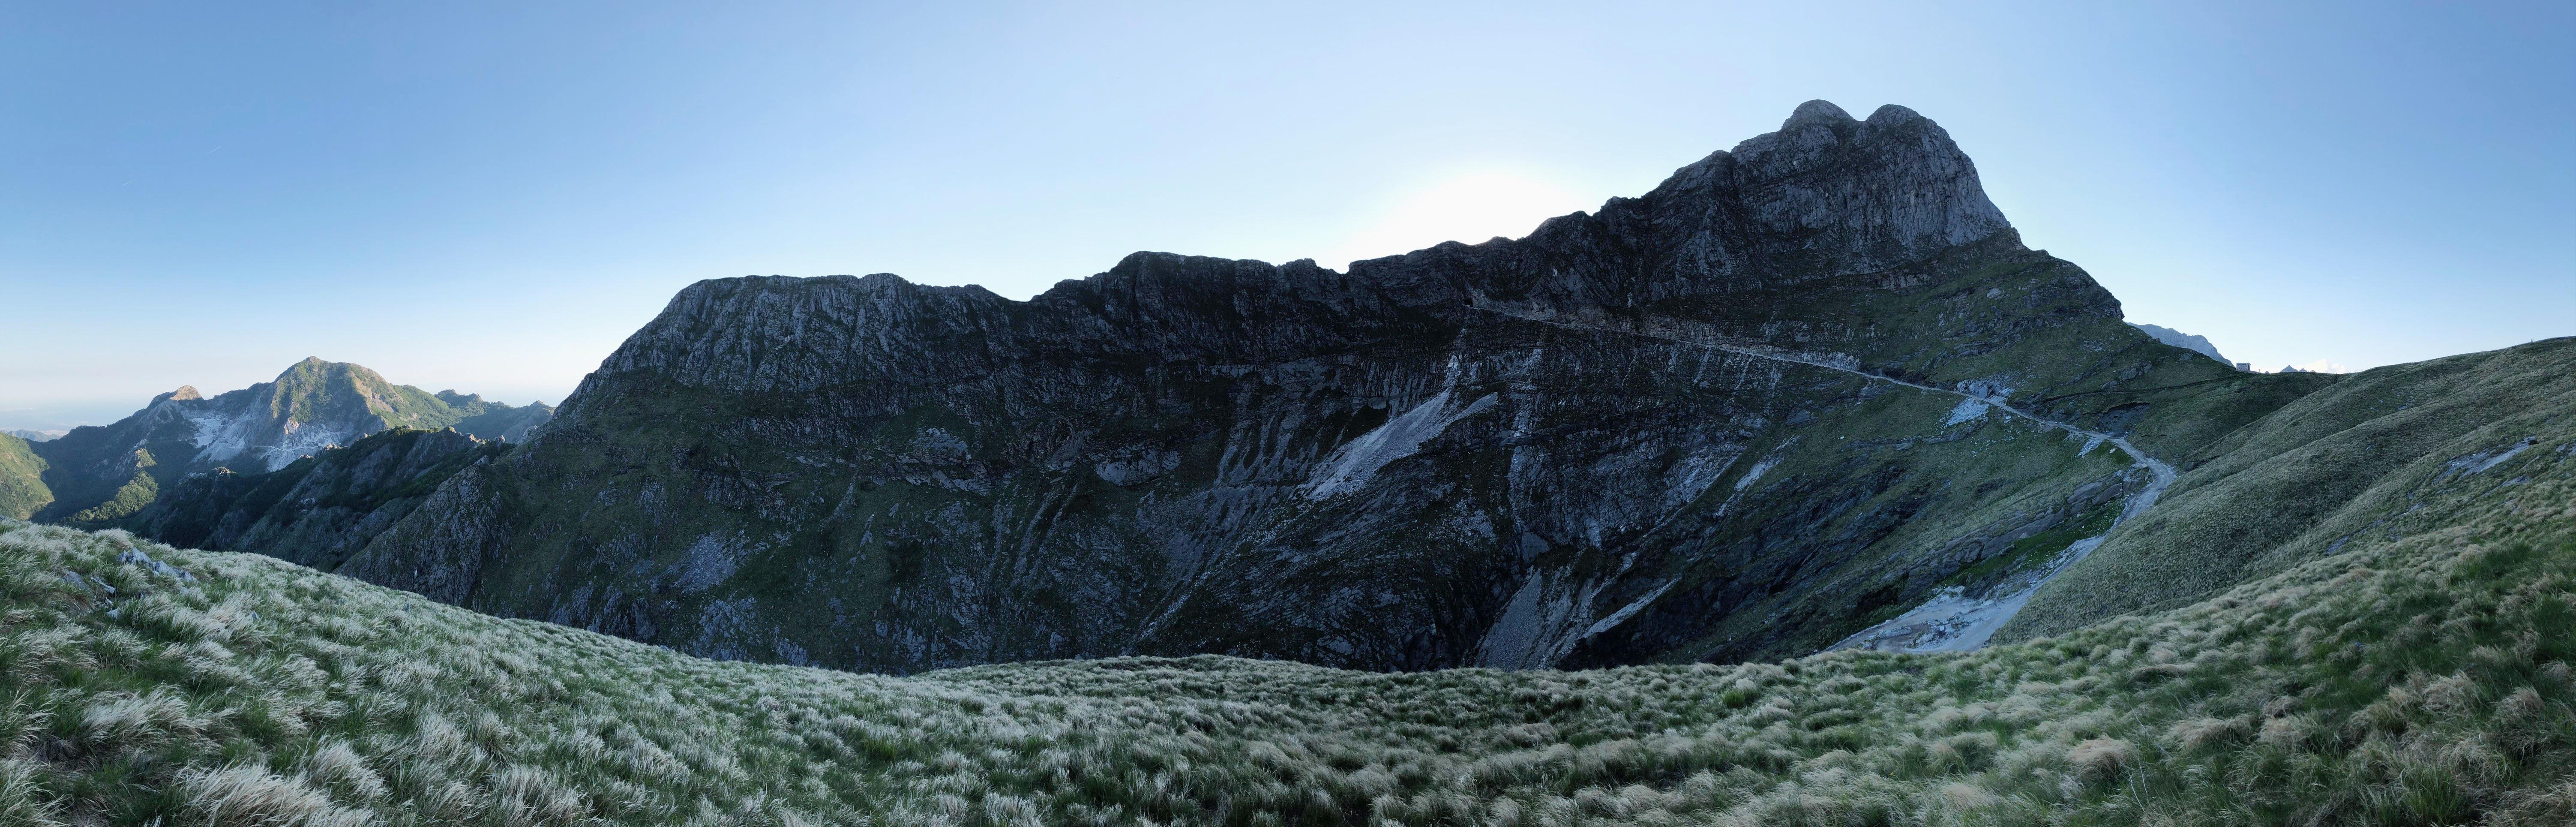 Apuan Alps Passo Sella Hike